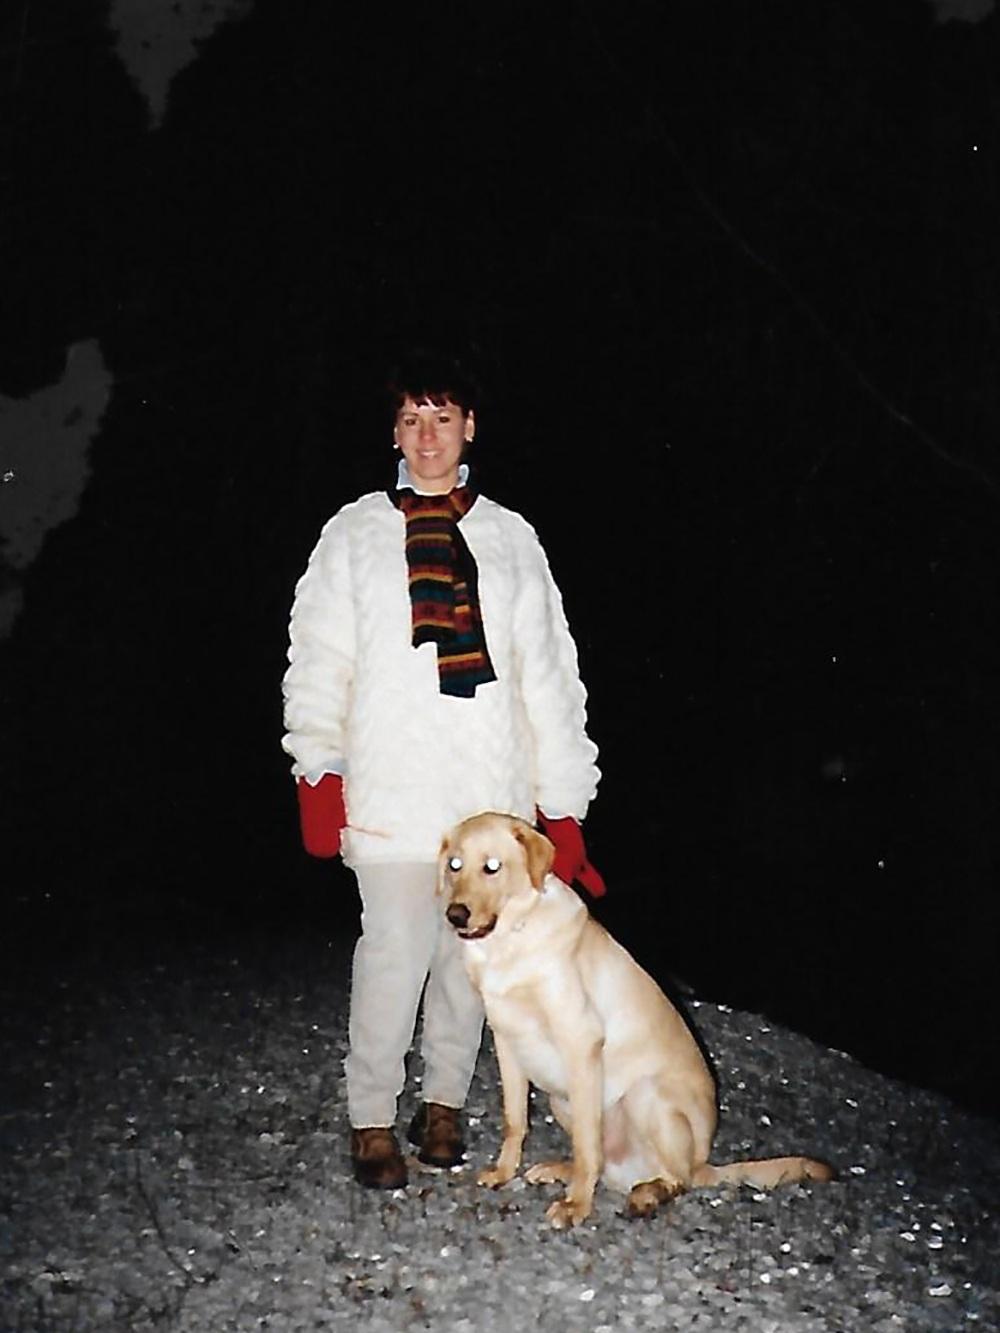 JANE+N+DOG+2.jpg